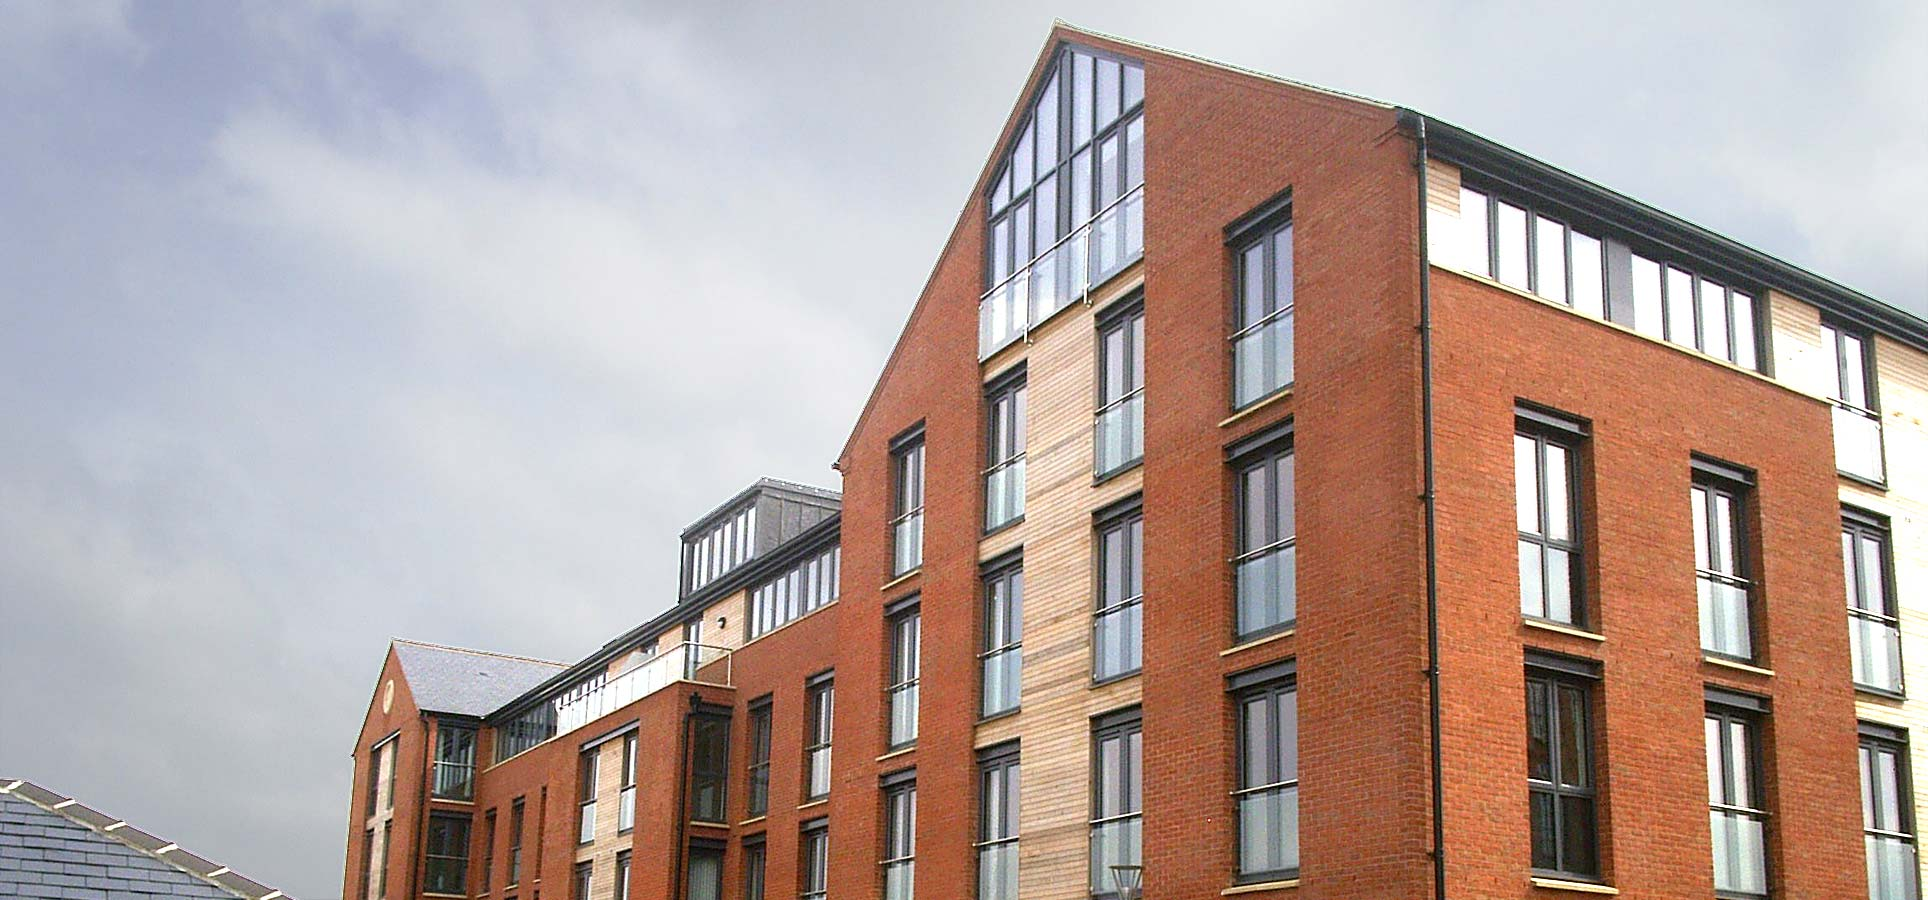 ANGLO SCOTIAN MILLS, Jessops Construction Ltd